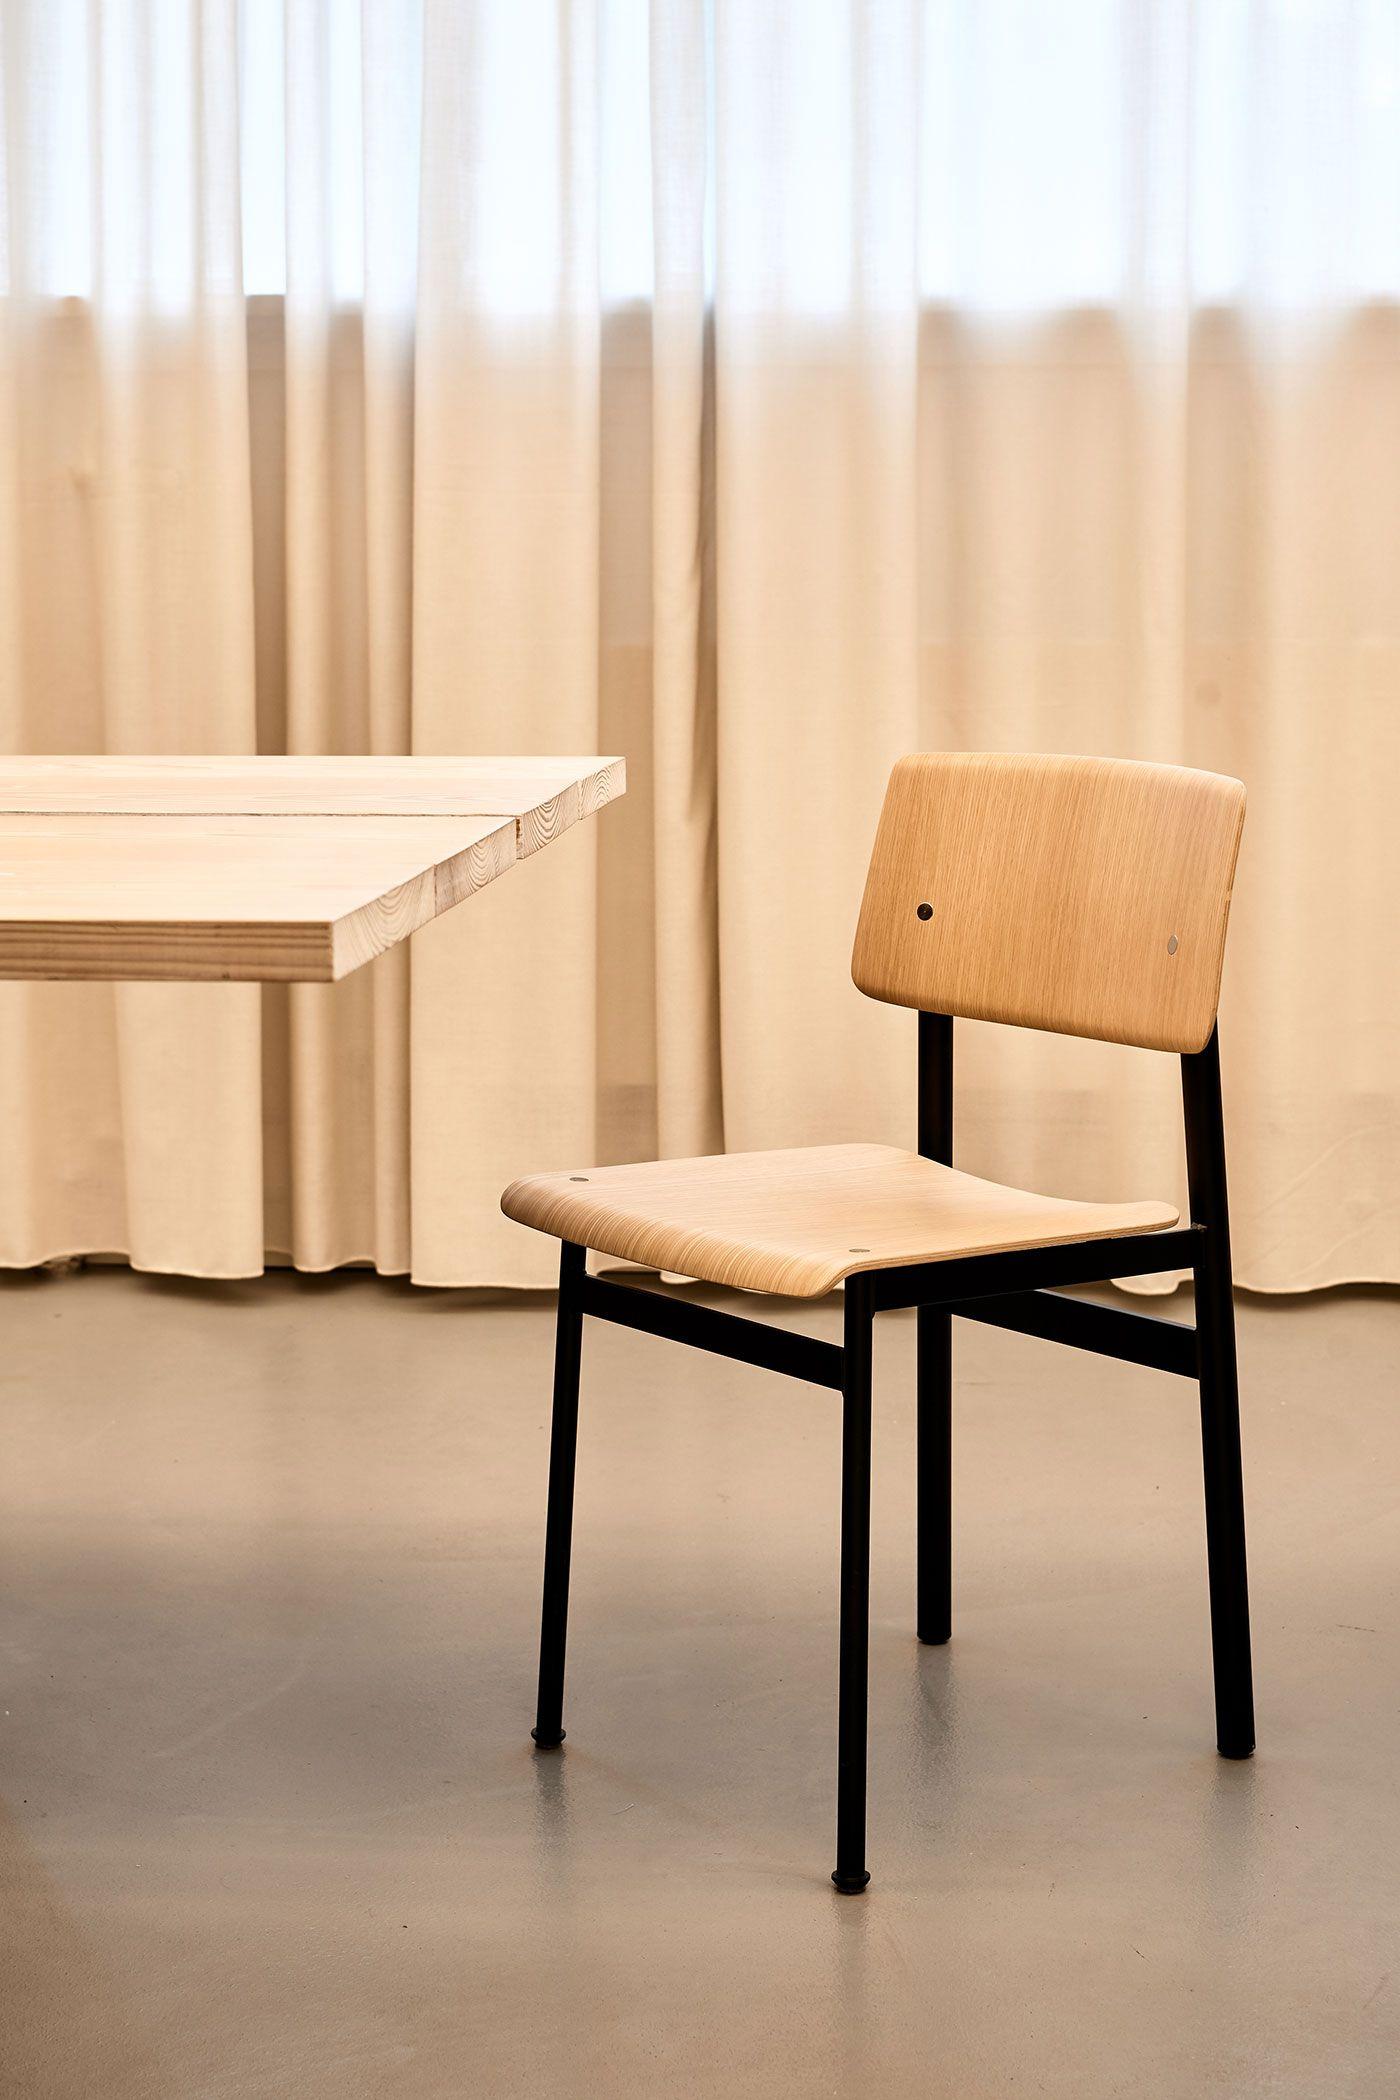 Scandinavian Furniture Inspiration From Muuto The Loft Chair Exemplifies Honest Simple Design Thank Scandinavian Furniture Design Chairs Loft Muuto Furniture